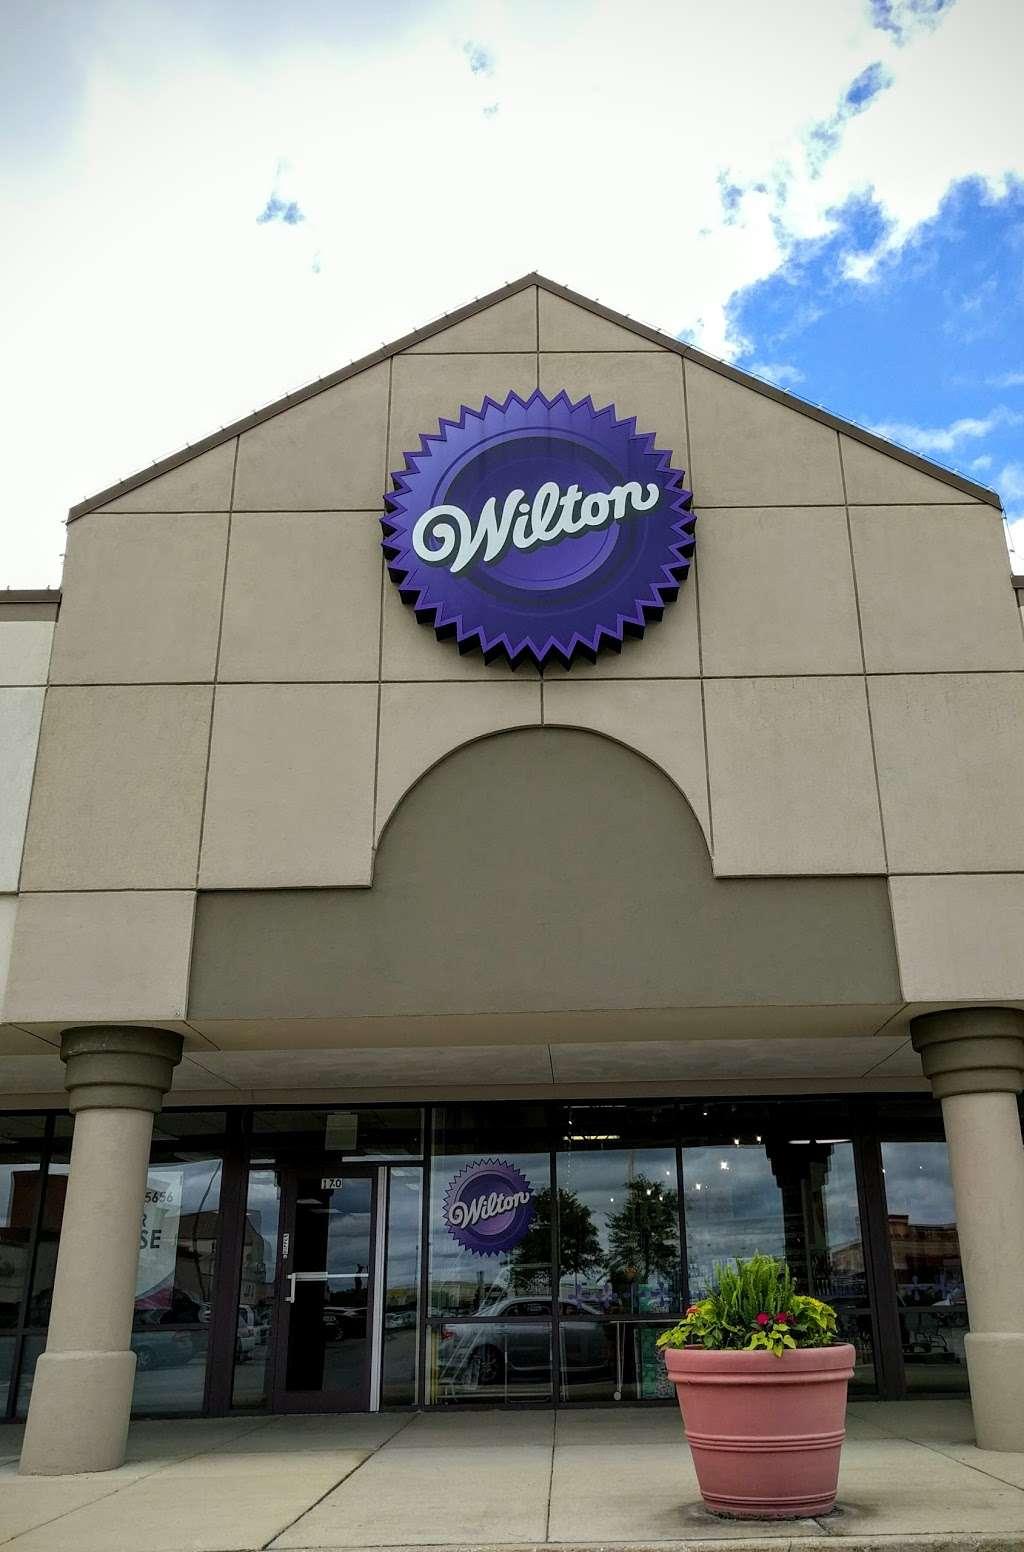 Wilton Baking Supply Store - store  | Photo 3 of 10 | Address: 7511 Lemont Rd, Darien, IL 60561, USA | Phone: (630) 985-6000